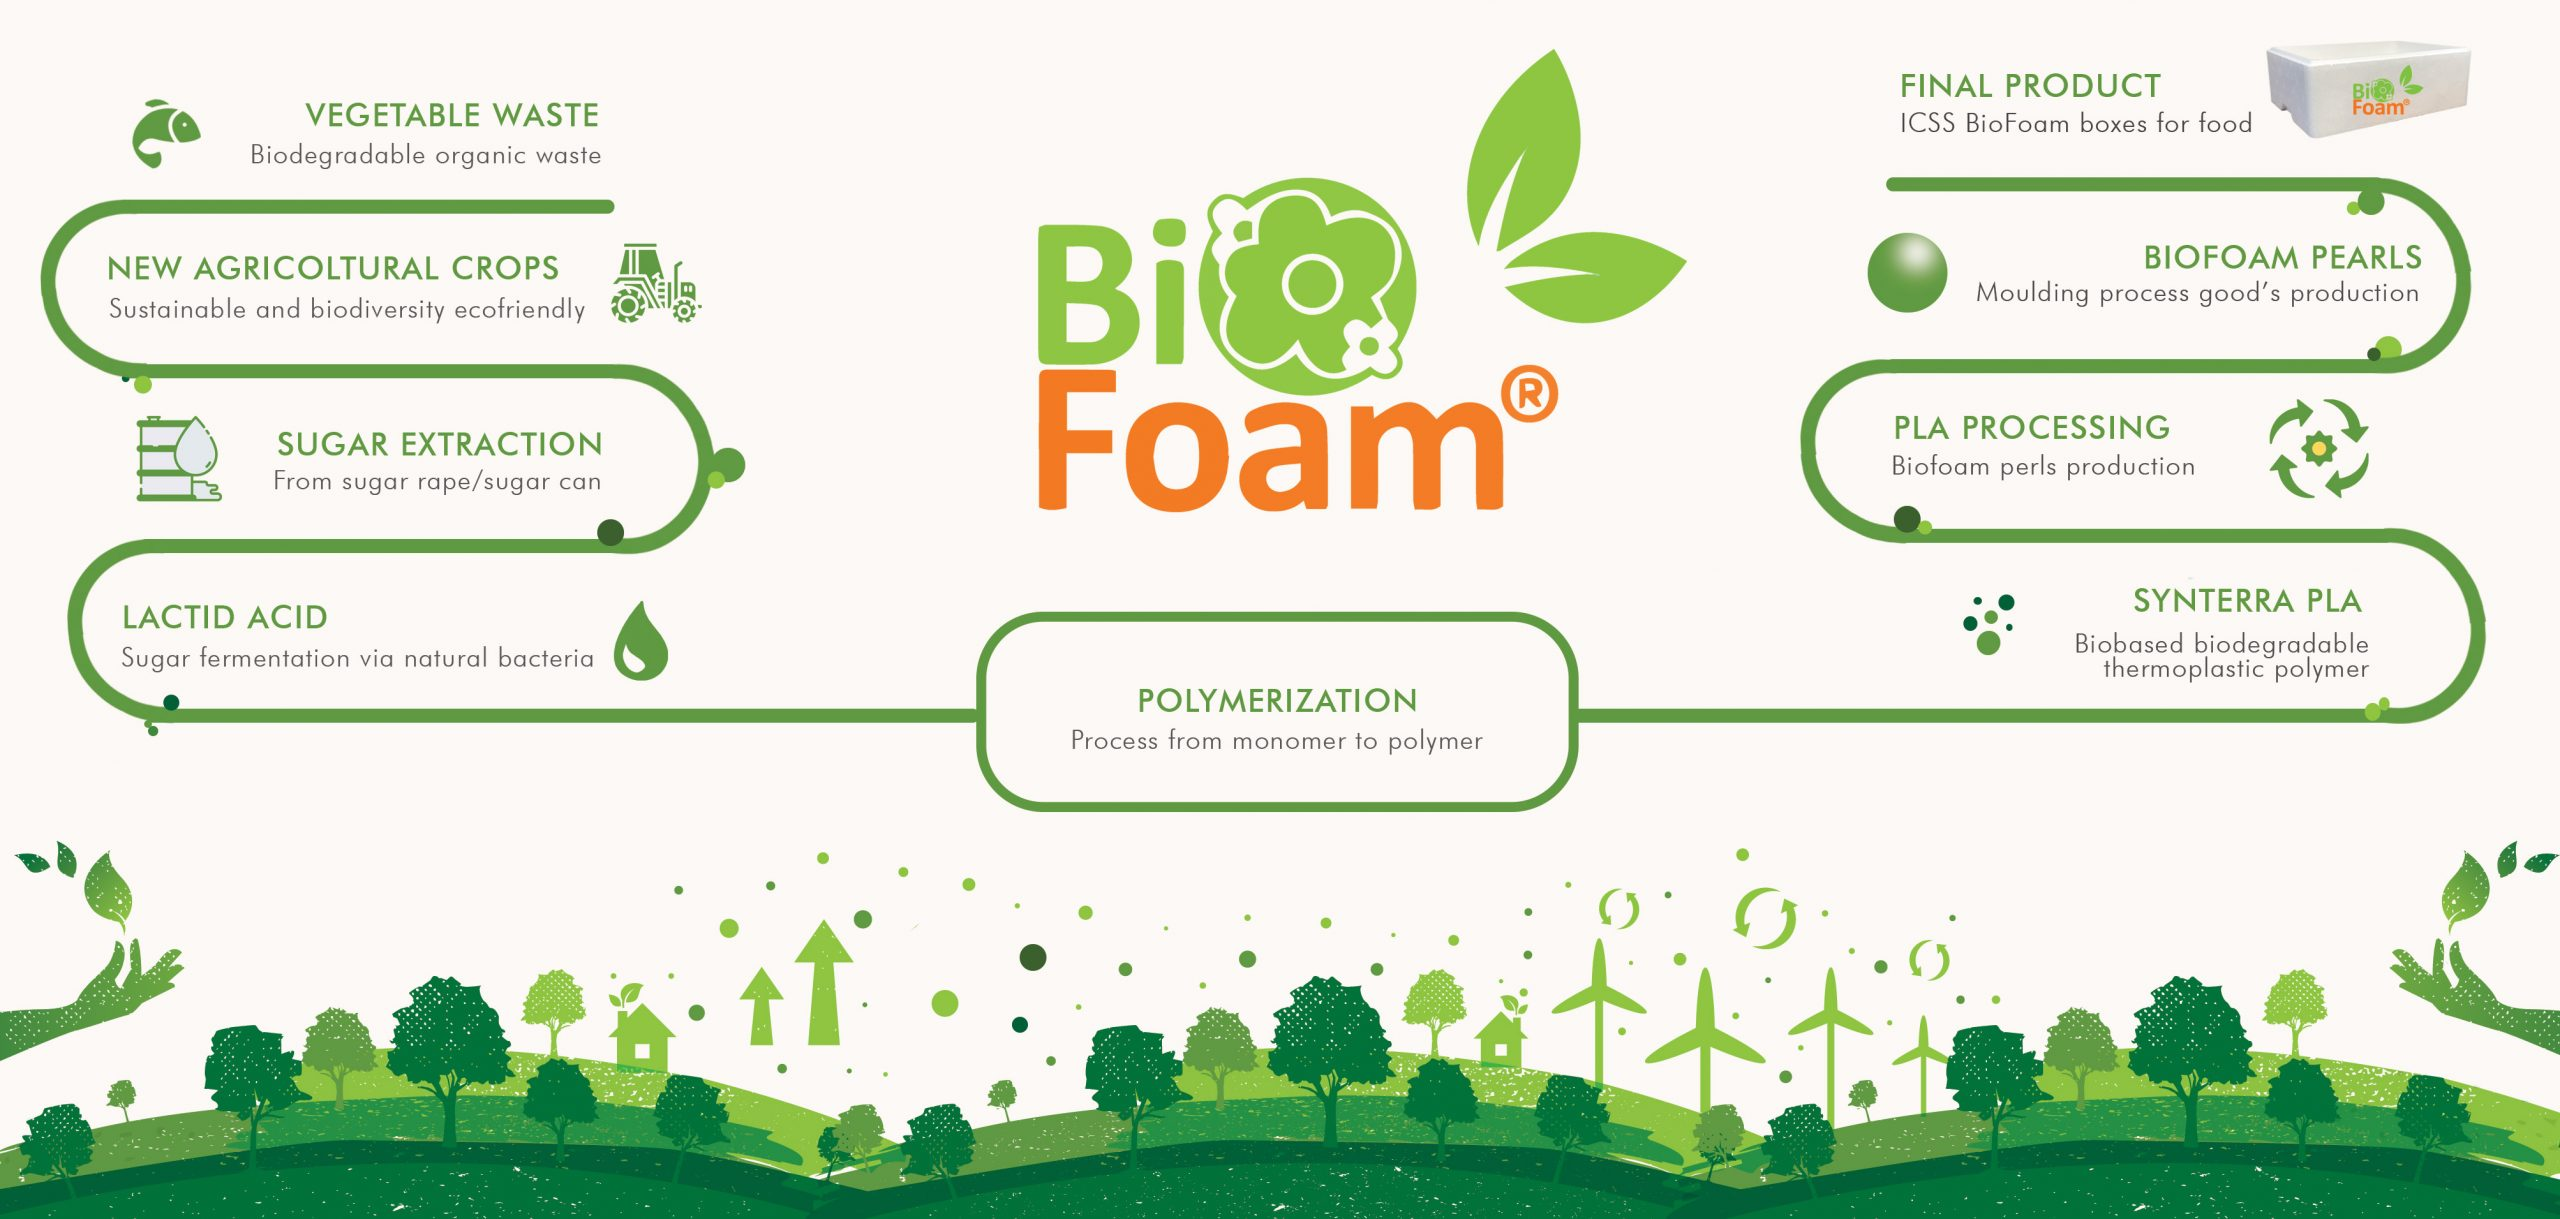 Infografica ambiente biofoam icss group